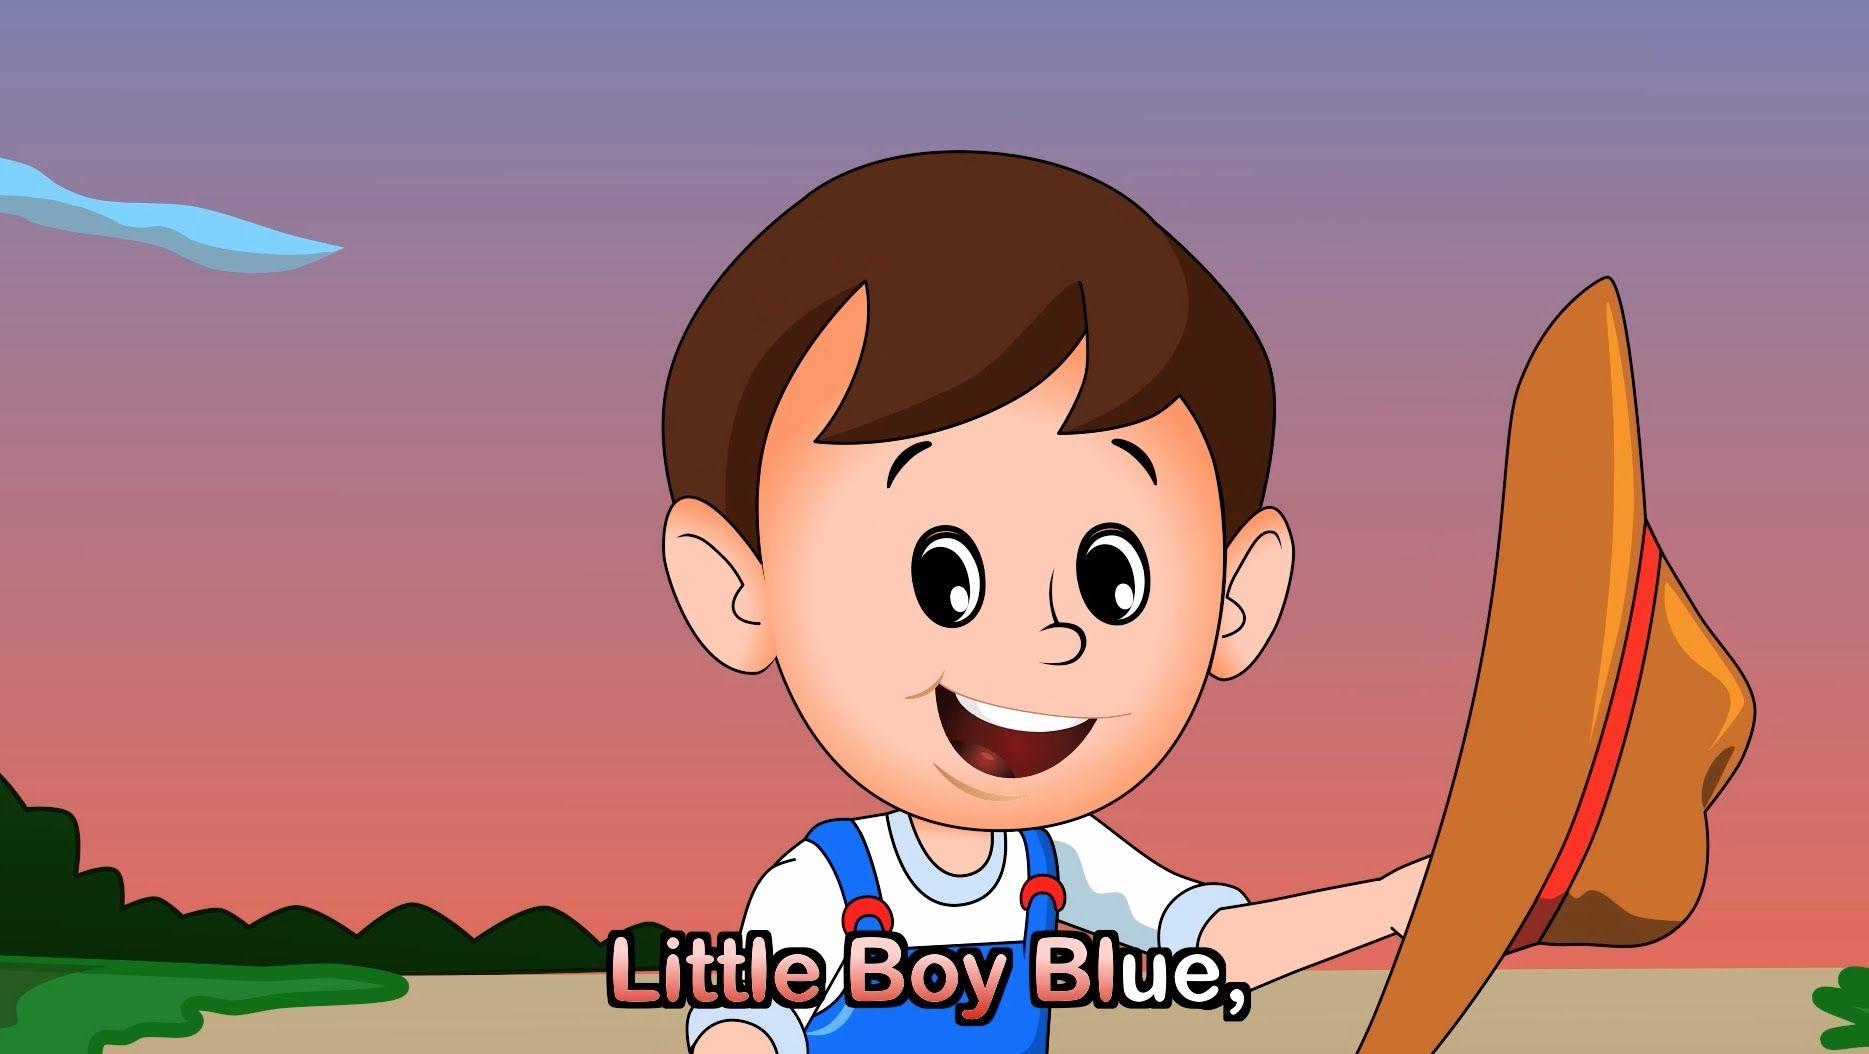 Little Boy Blue with lyrics Lullabies & Nursery Rhymes